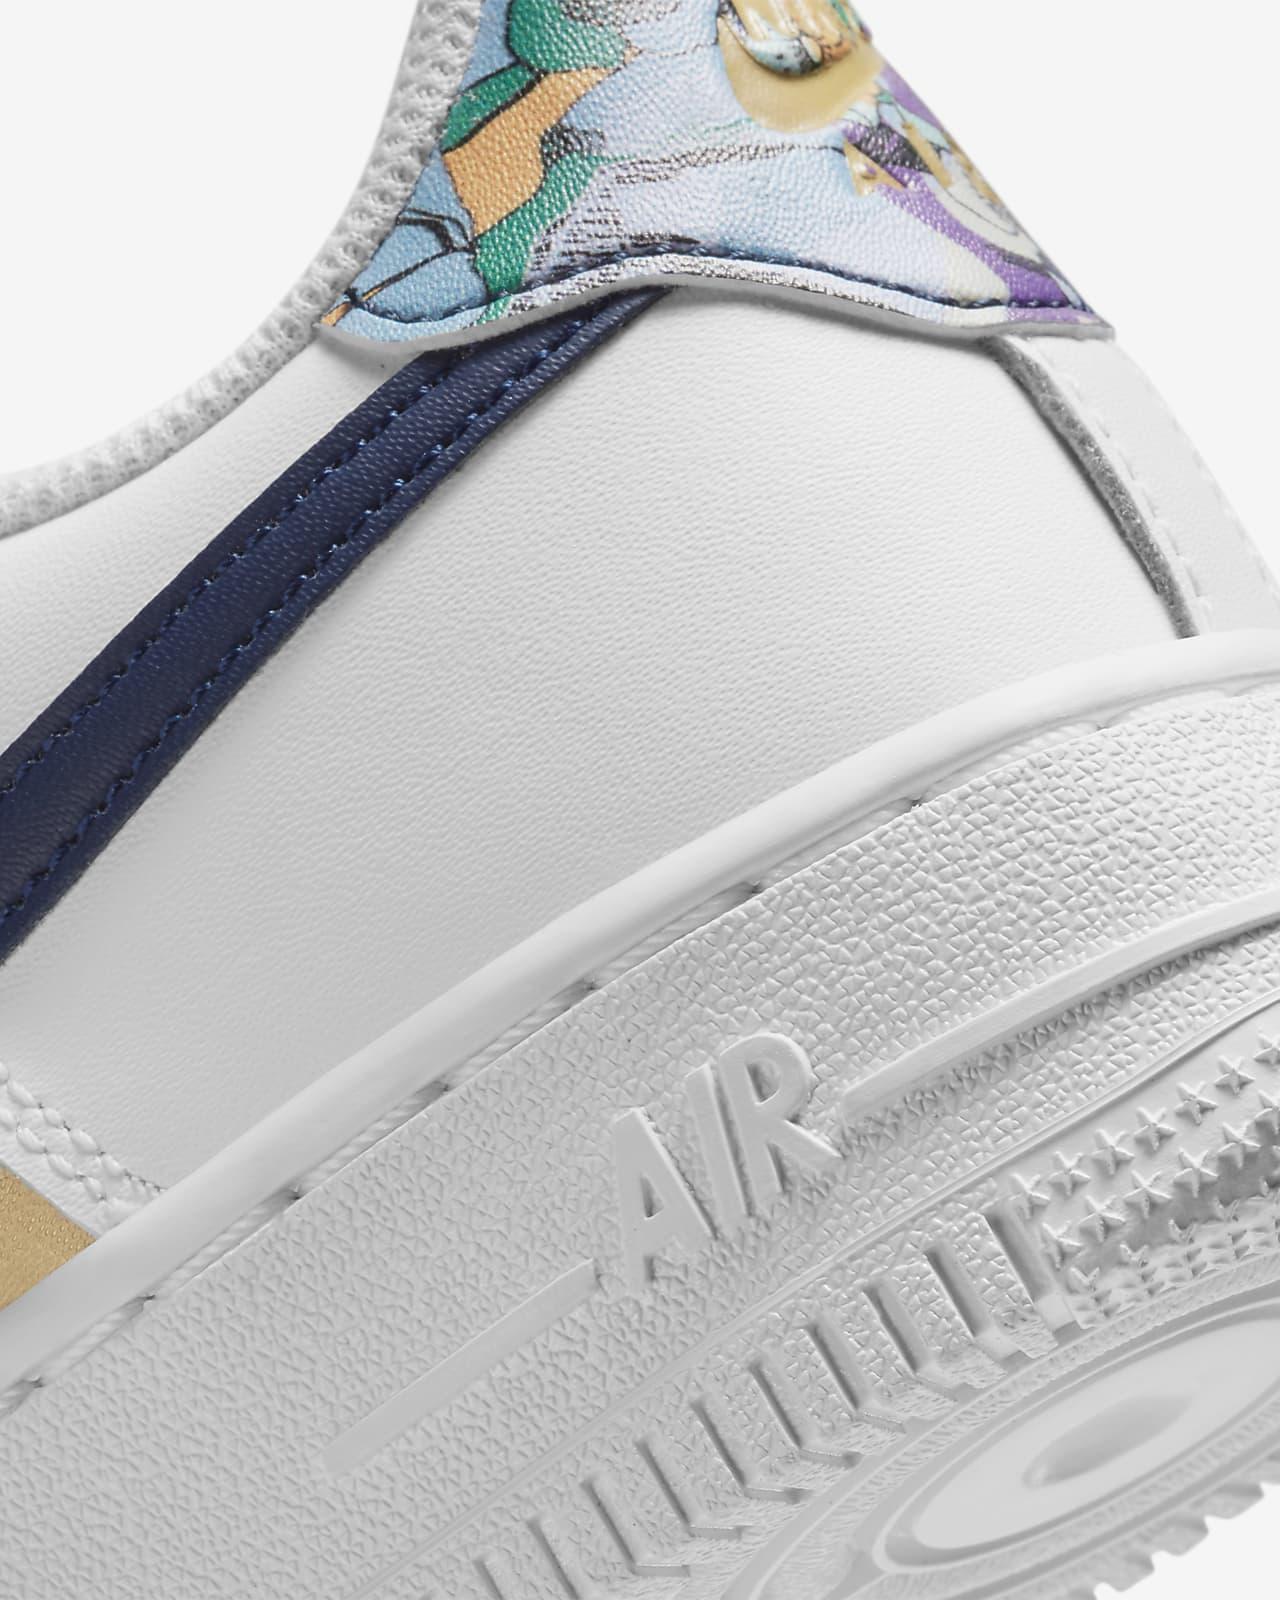 Nike Air Force 1 Low LV8 Big Kids' Shoes